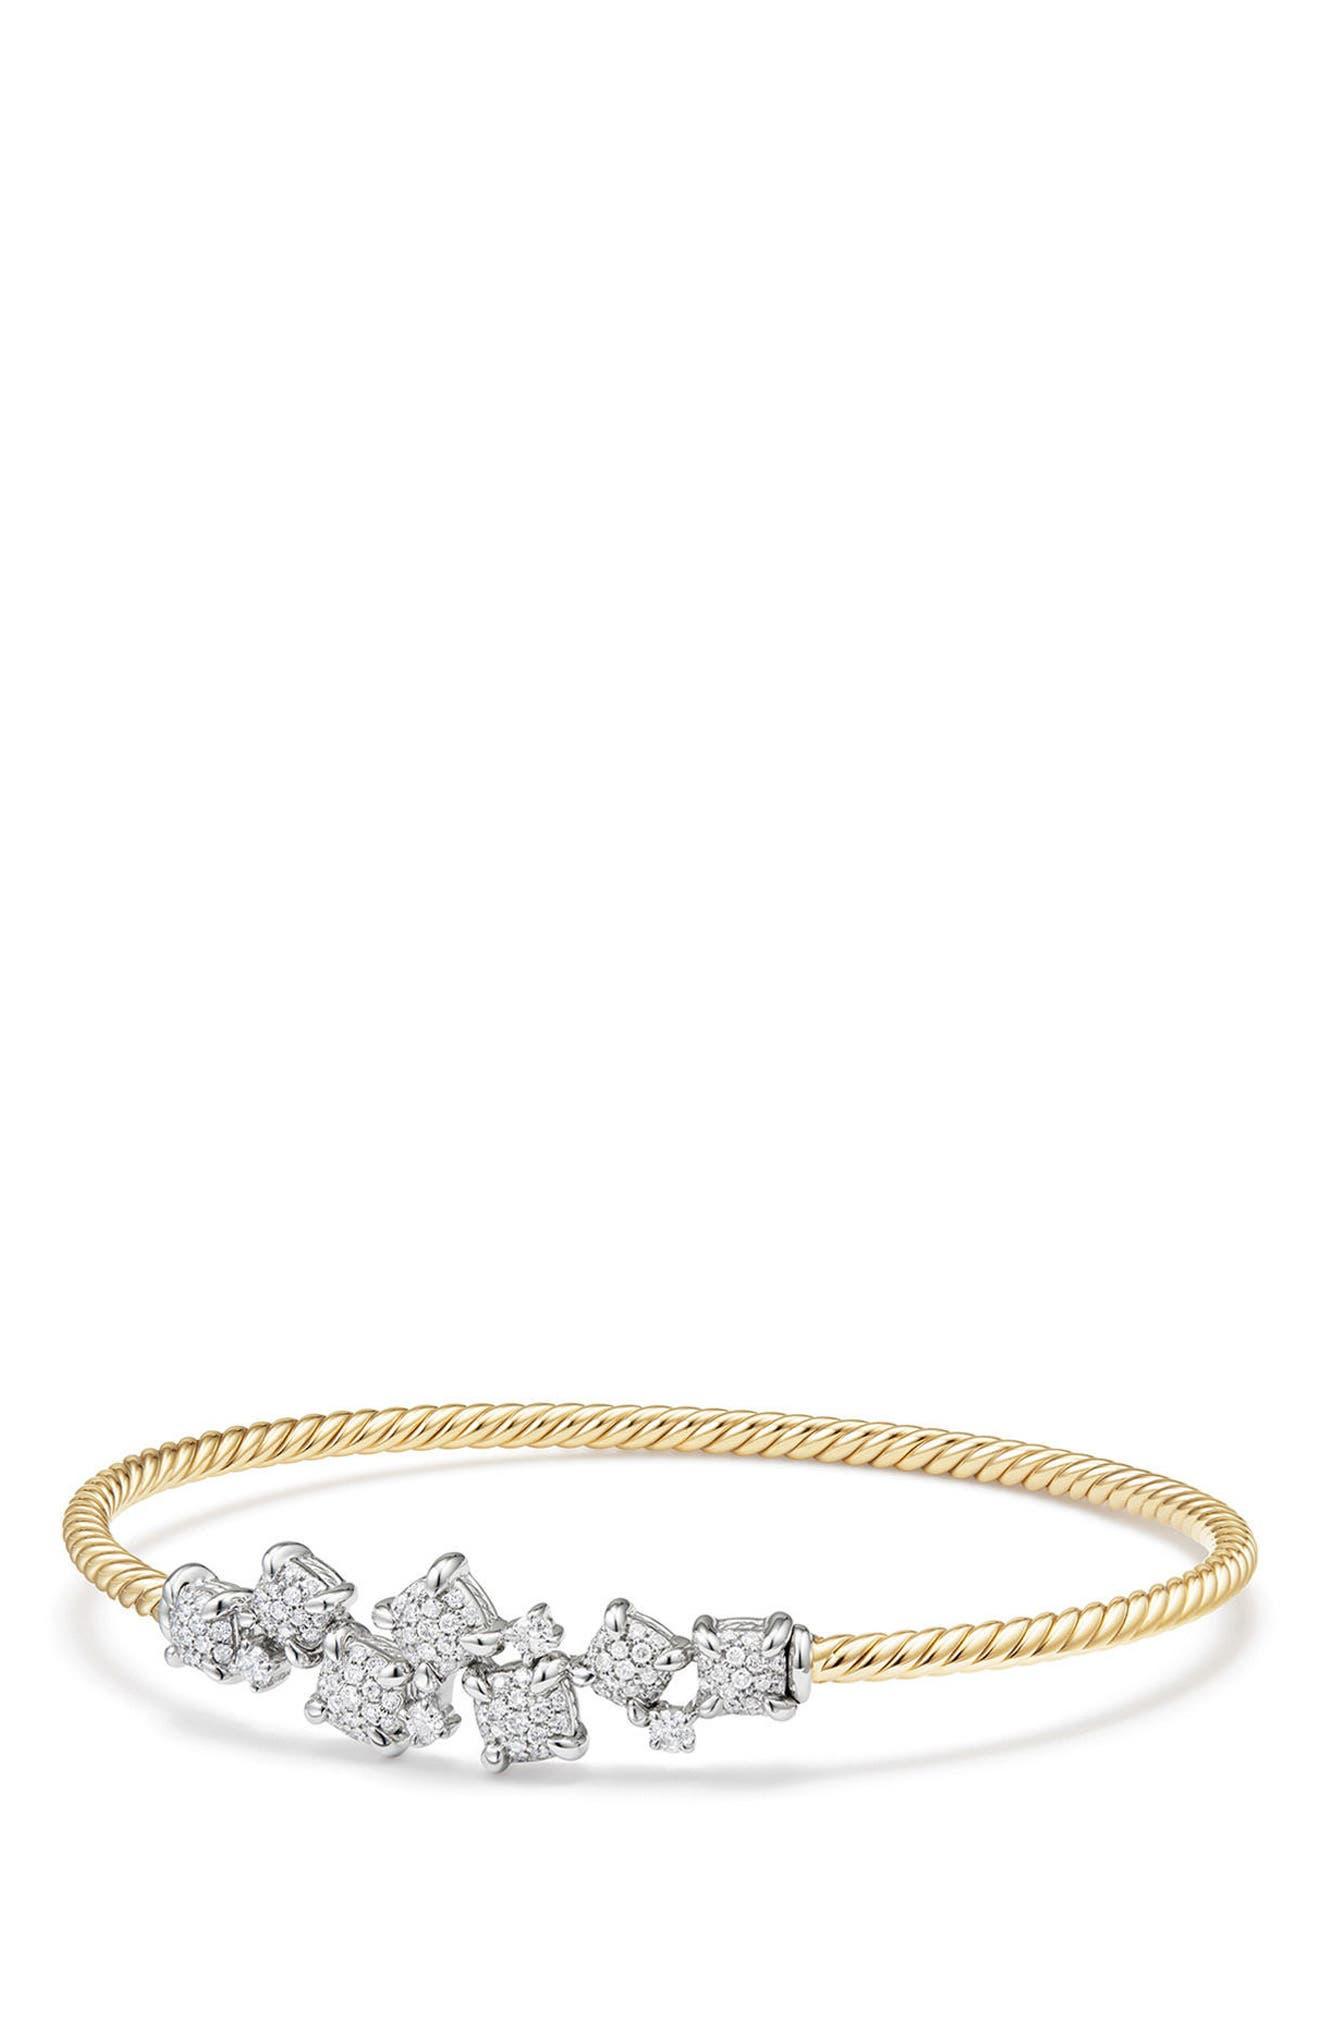 Main Image - David Yurman Precious Châtelaine Bracelet with Diamonds in 18K Gold